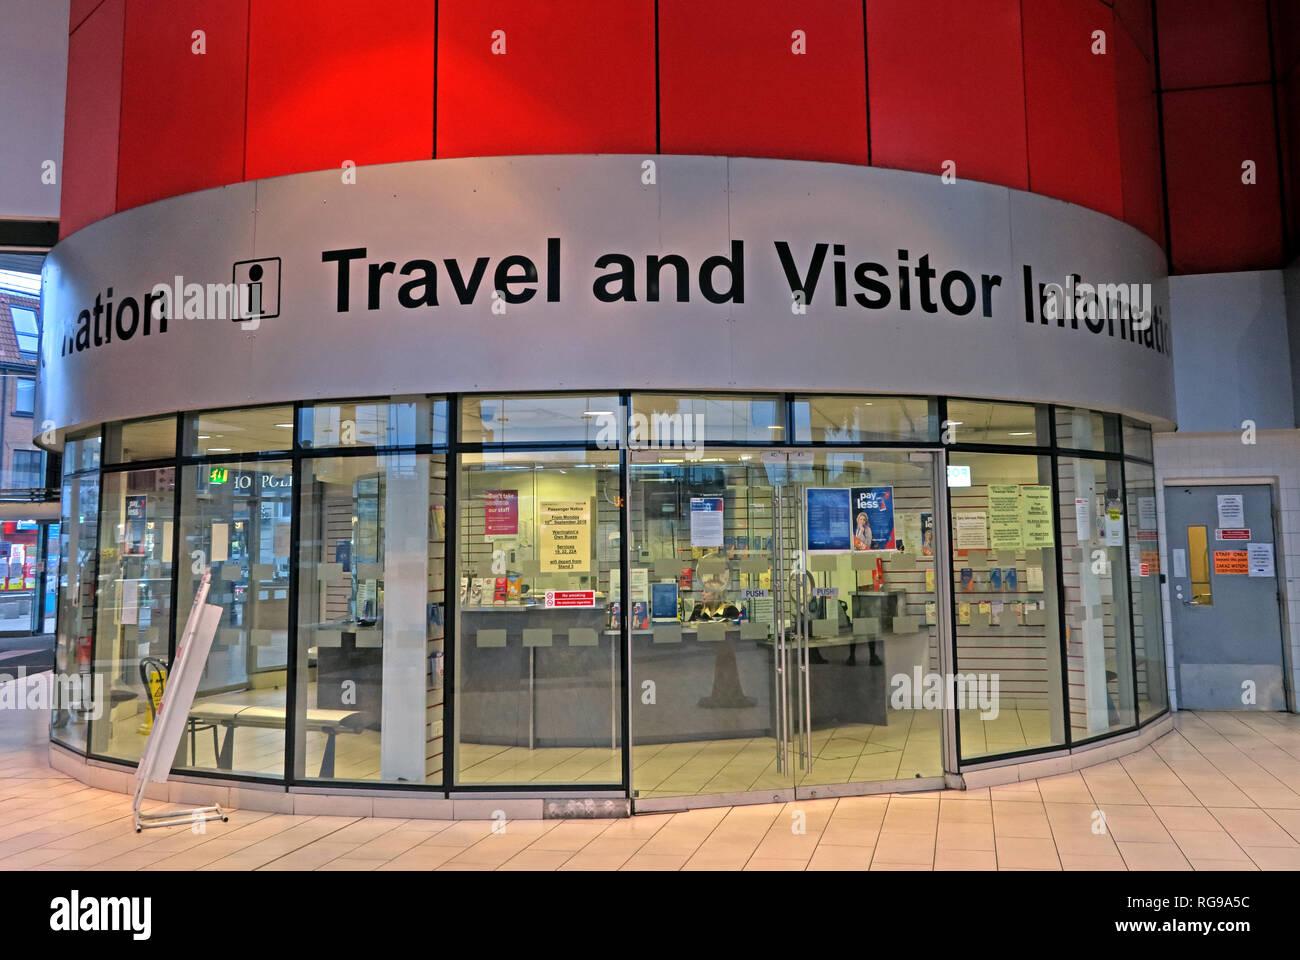 GoTonySmith,HotpixUK,@HotpixUK,UK,Cheshire,GB,transport,travel,bus,rail,tourist,tourism,WA1